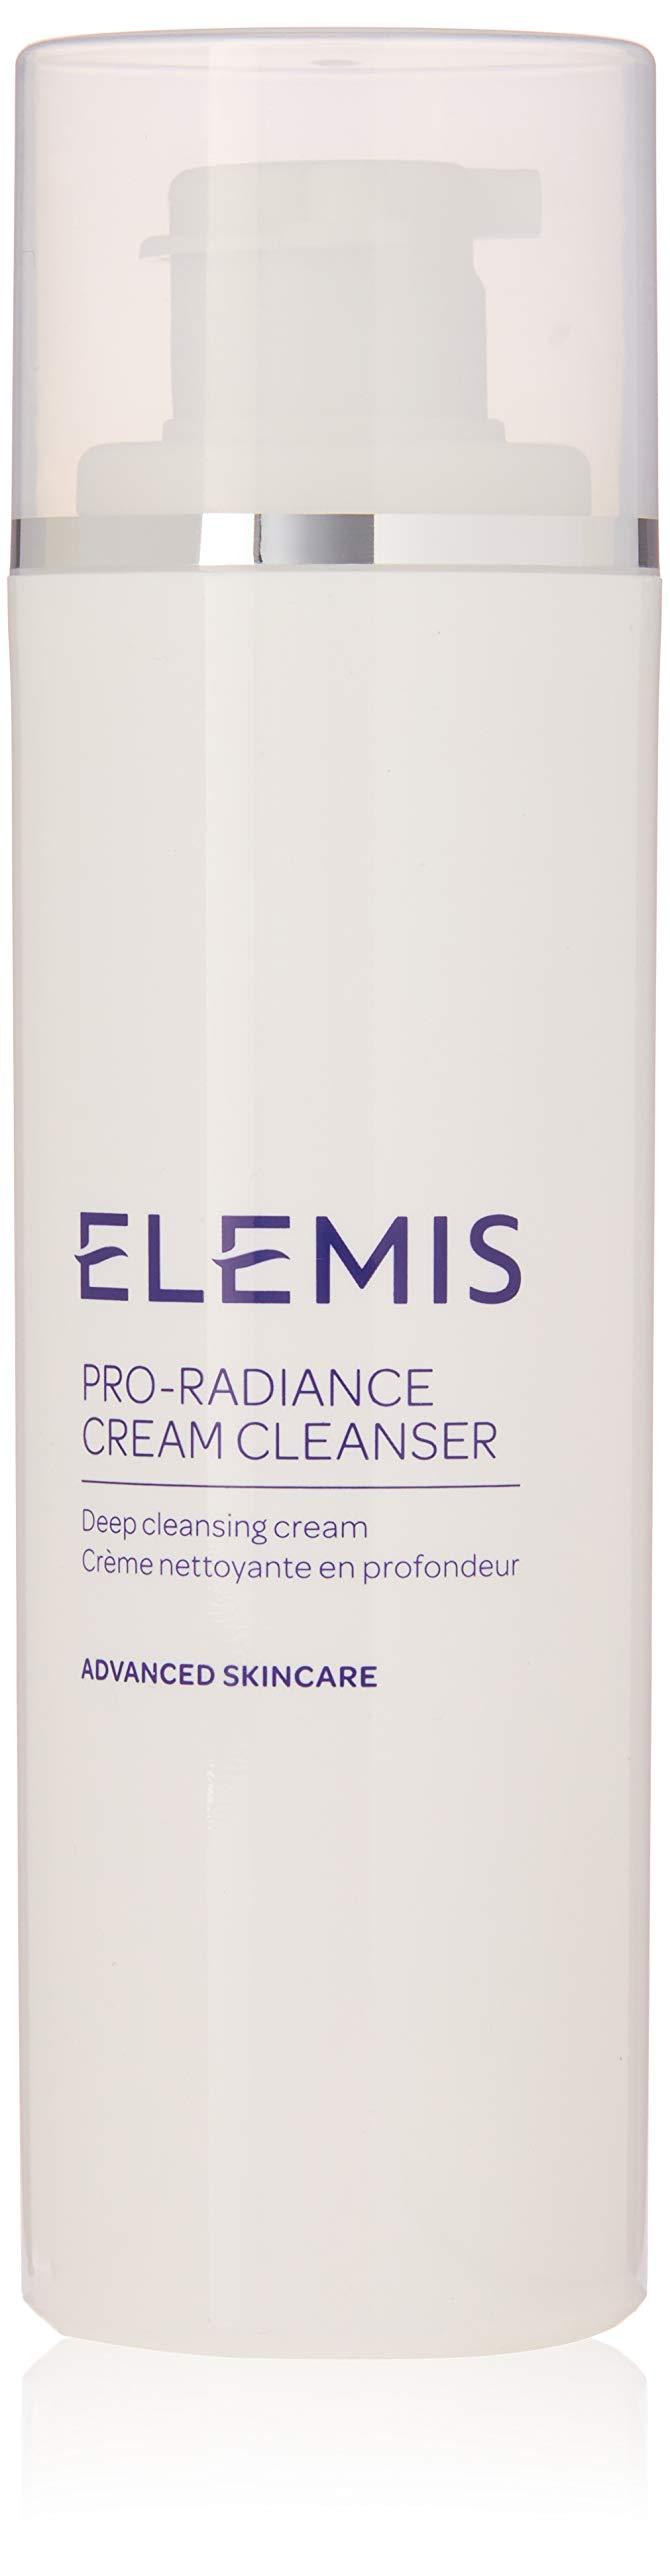 ELEMIS Pro-Radiance Cream Cleanser, Deep Cleansing Cream, 5.0 fl. oz.